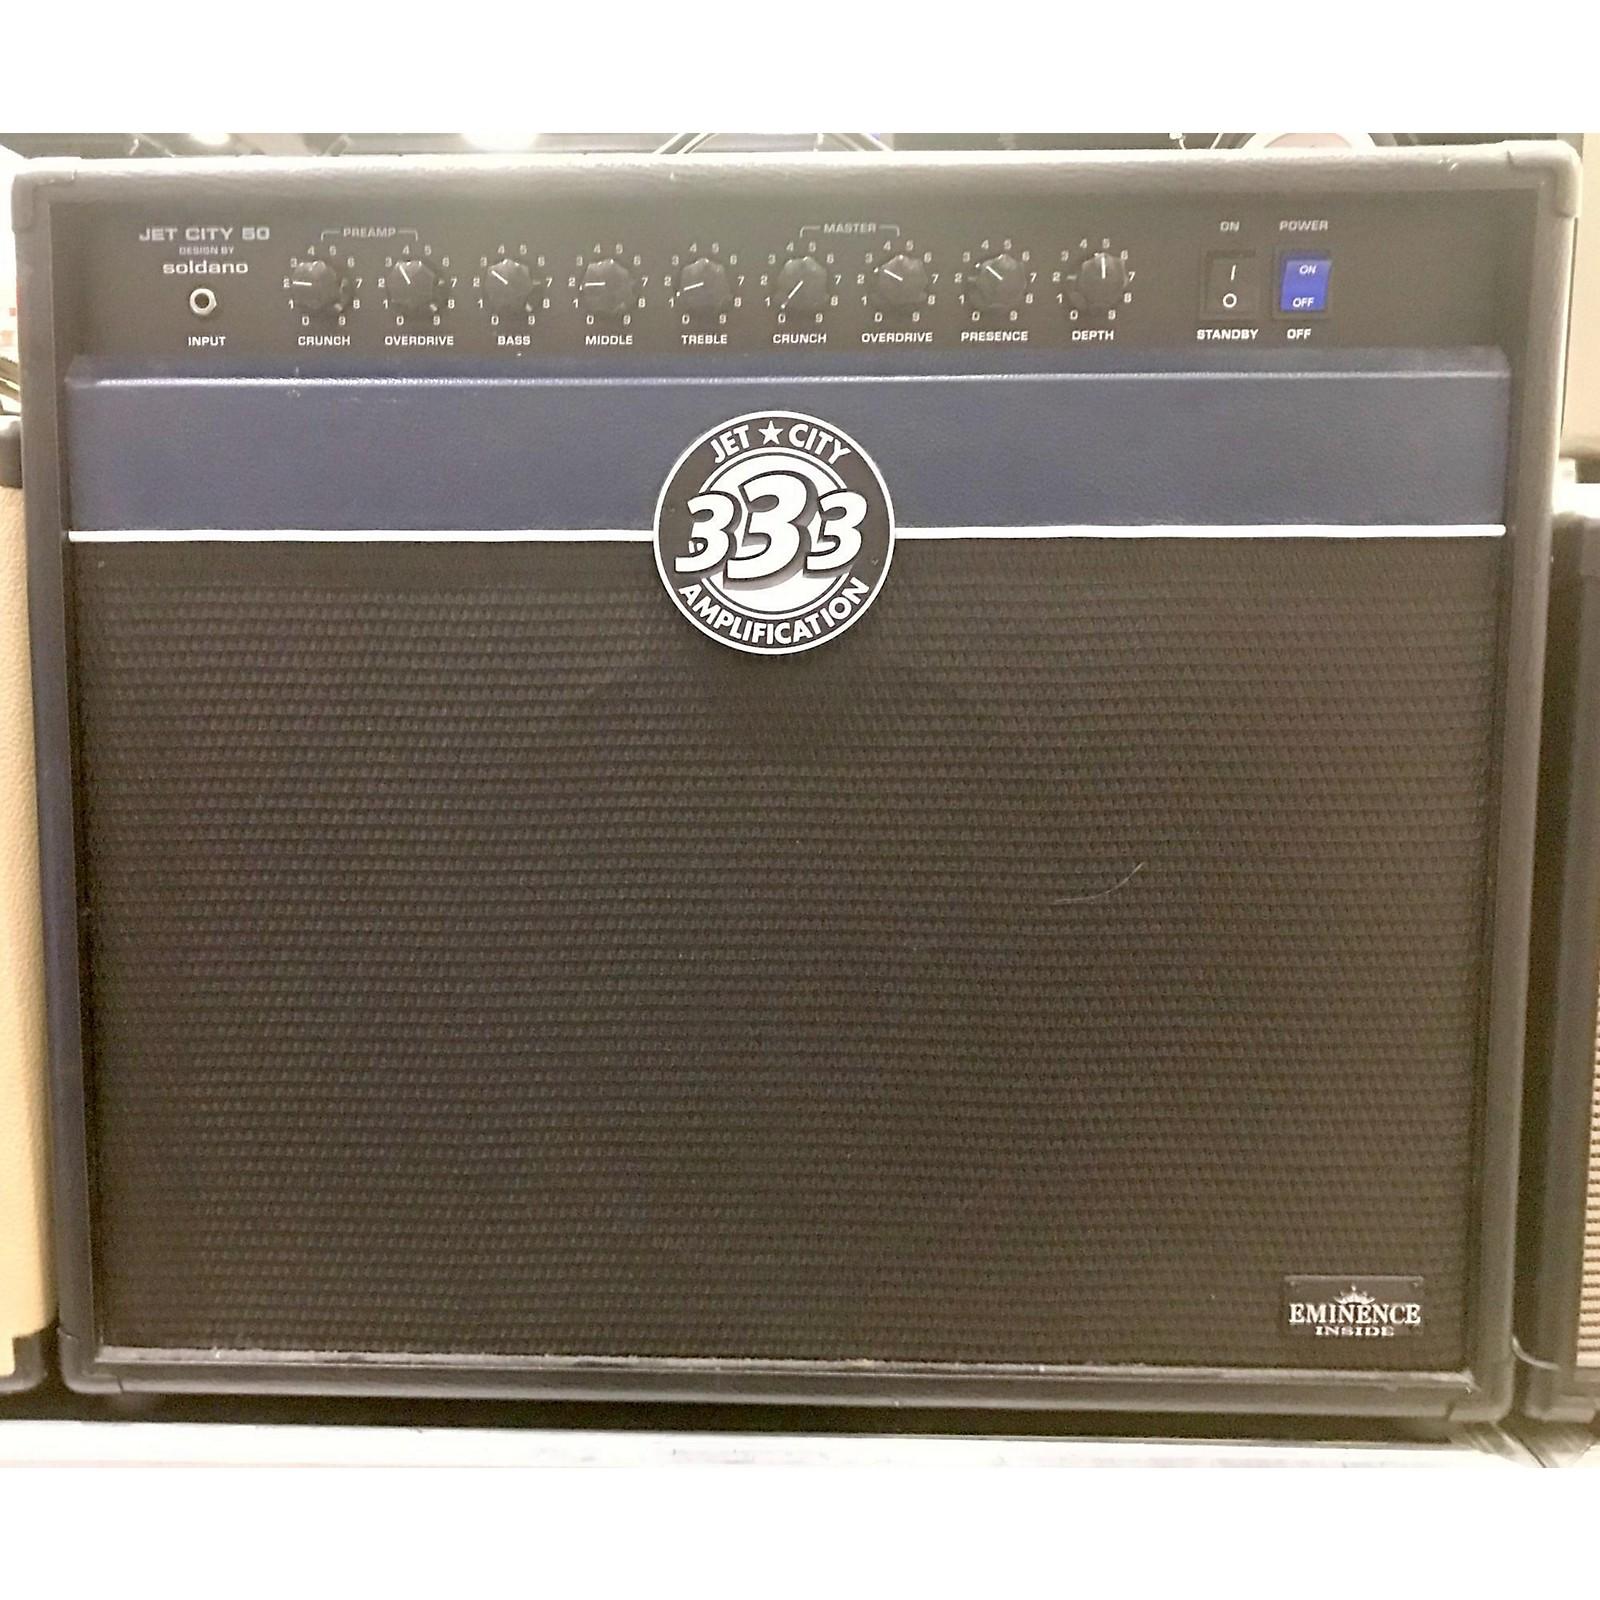 Jet City Amplification JT50 Tube Guitar Combo Amp